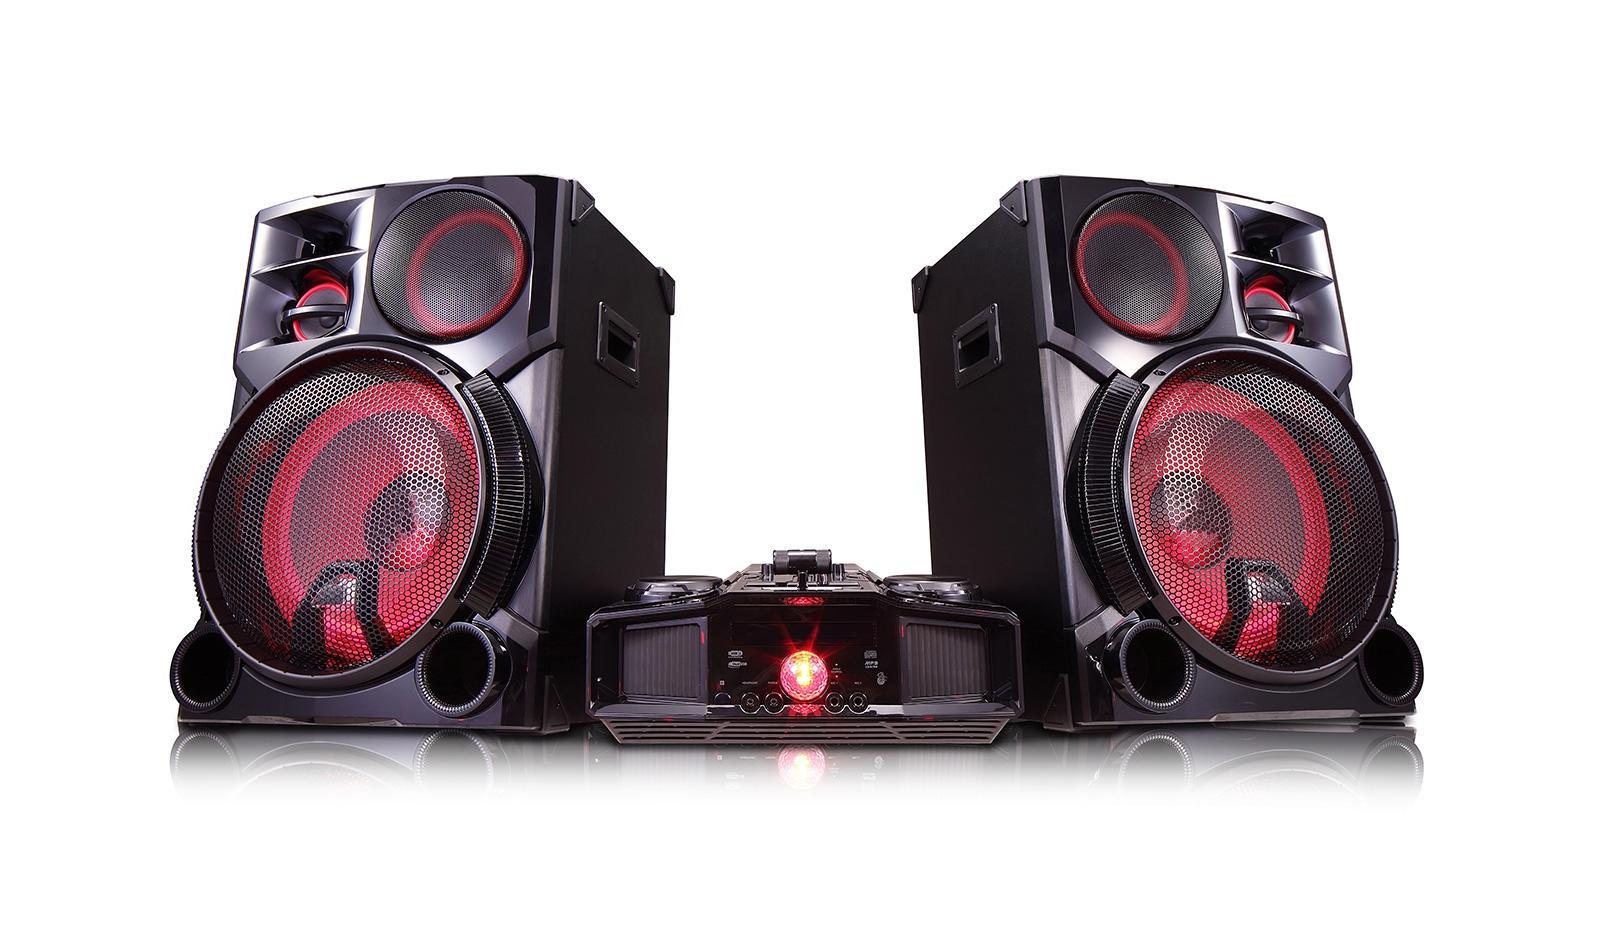 Lg Cm9960 4800w Hi Fi Entertainment System With Bluetooth